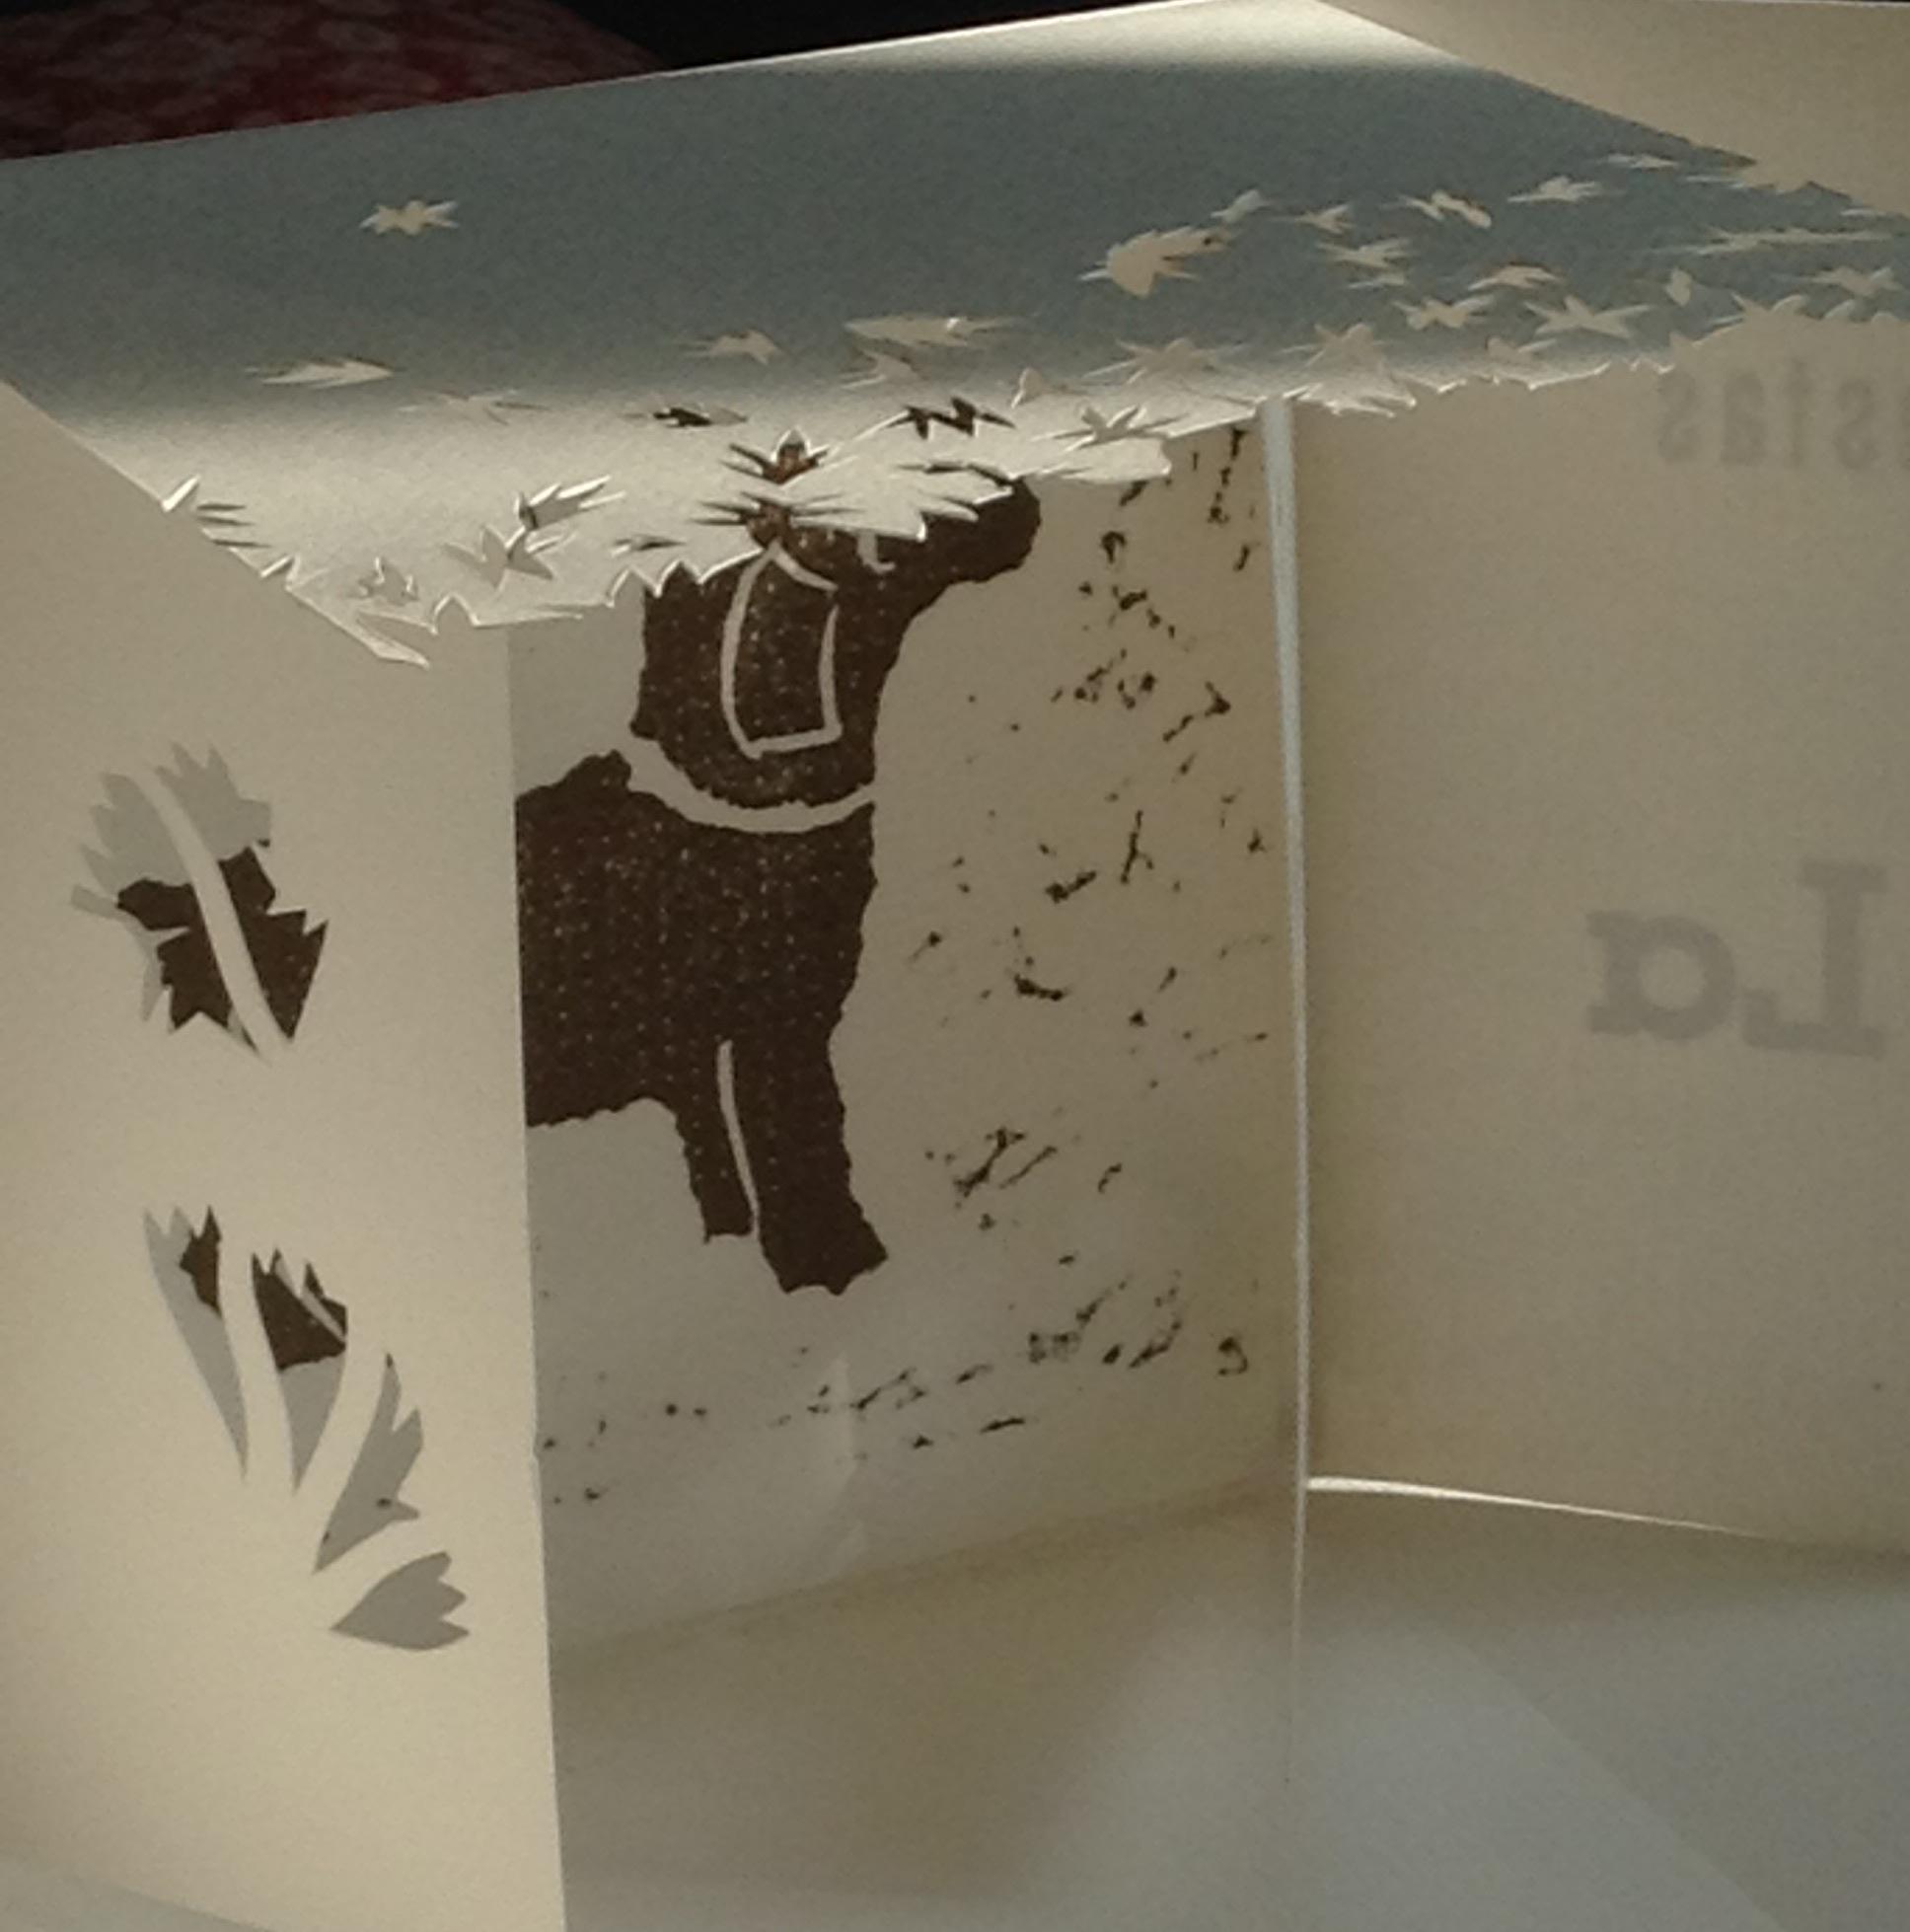 Amira aranda  artist book image